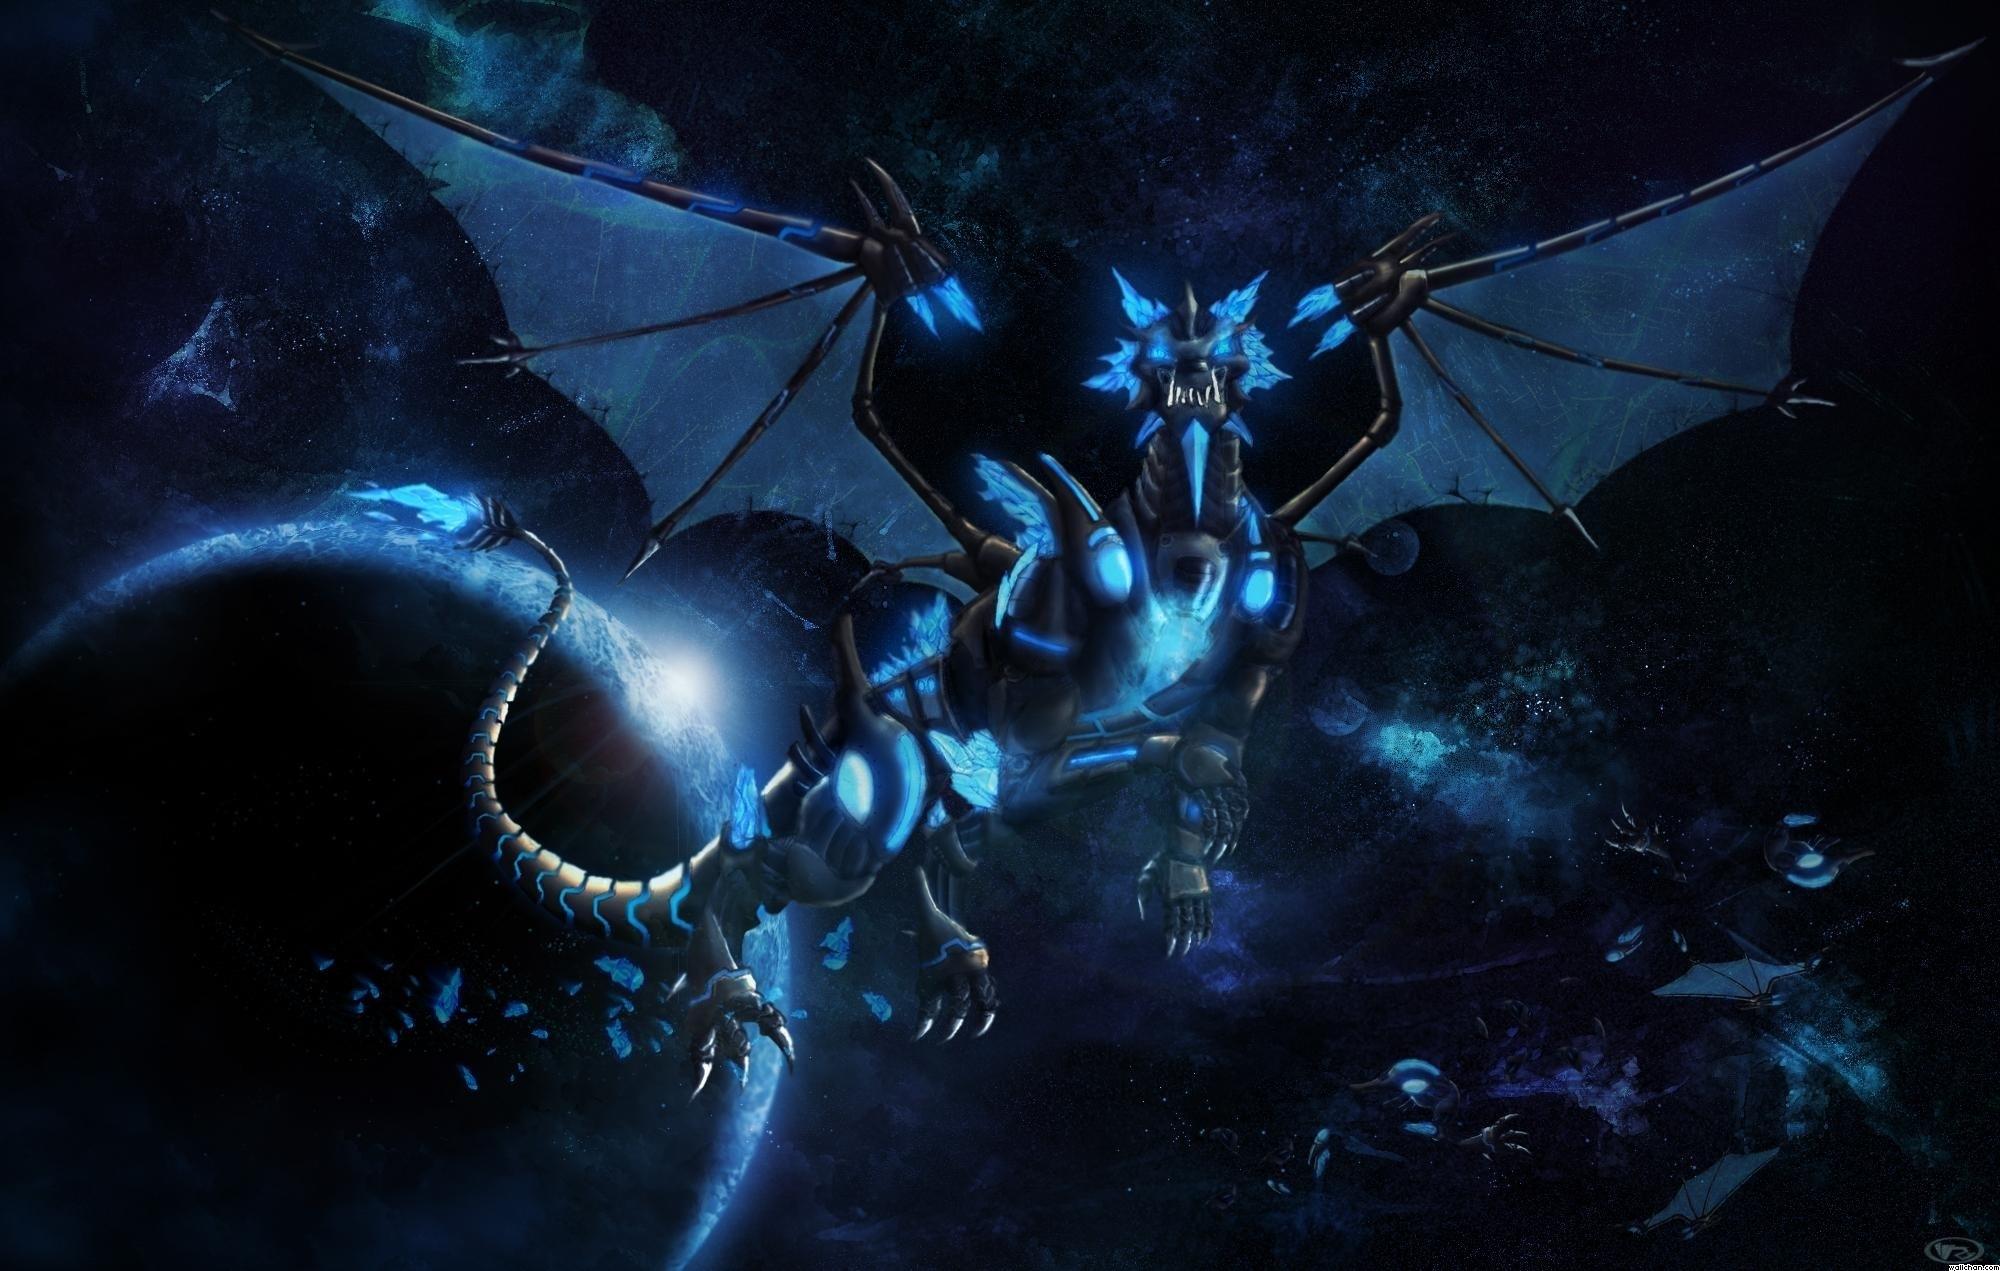 black and blue dragon wallpaper 1920x 1080 - hdwall